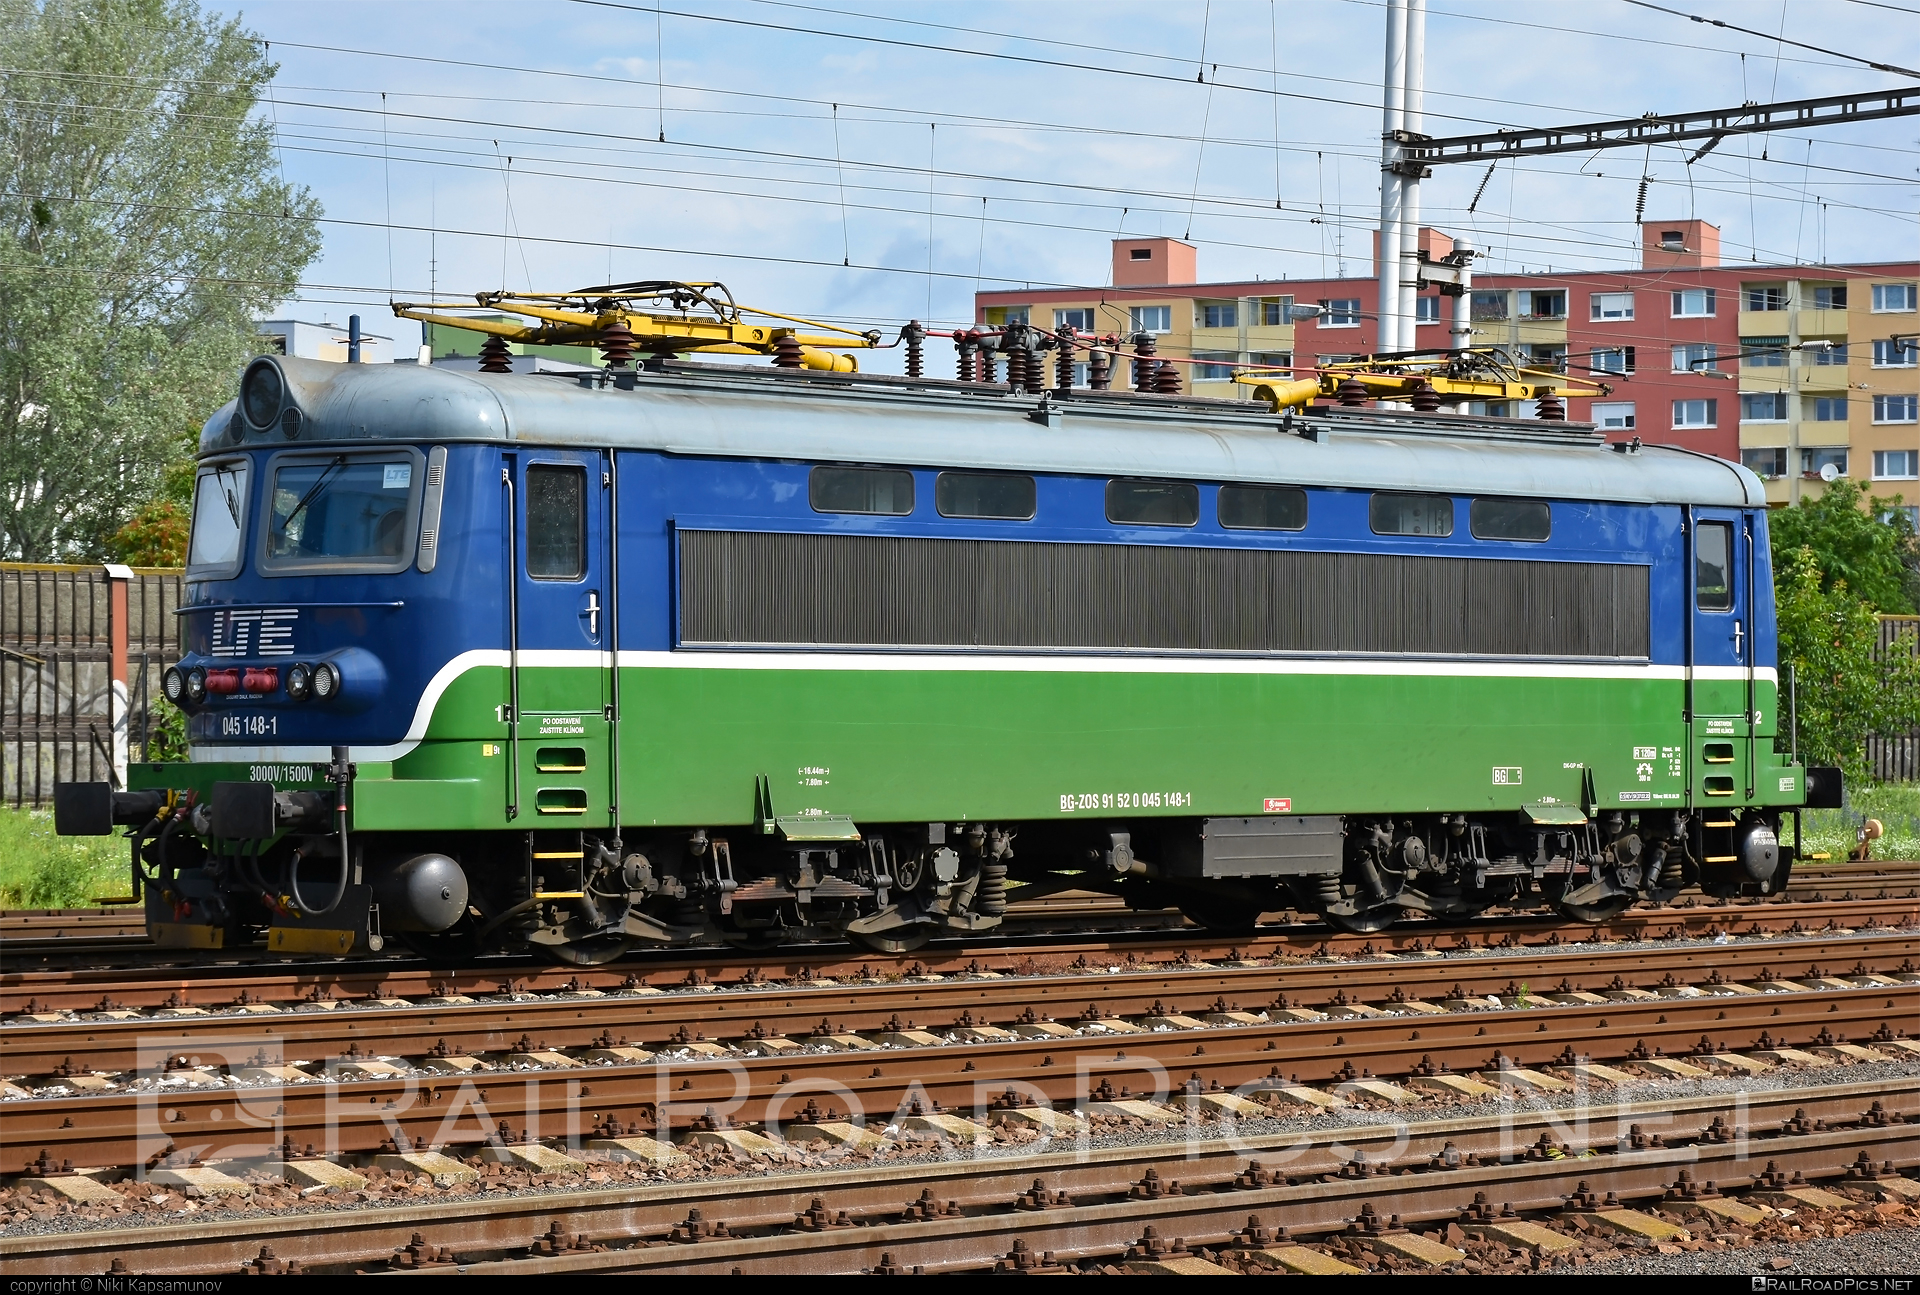 Škoda 73E - 045 148-1 operated by LTE Logistik a Transport Slovakia, s.r.o. #locomotive242 #lte #plechac #skoda #skoda73e #zoszvolen